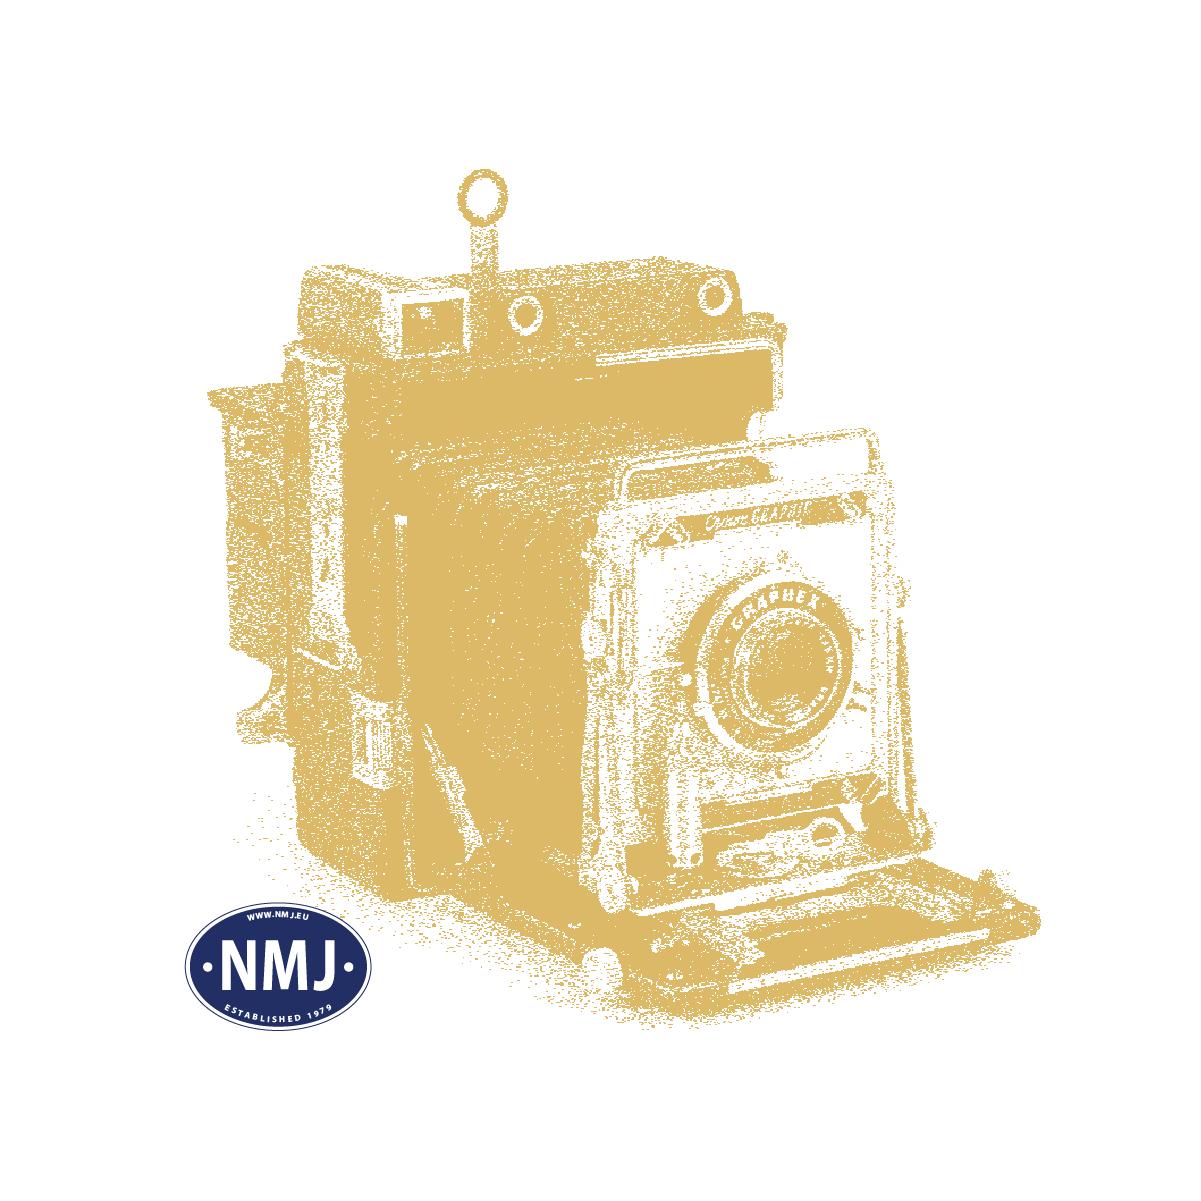 NMJT87.401AC - NMJ Topline NSB El11b.2146, Red/Black, AC Digital